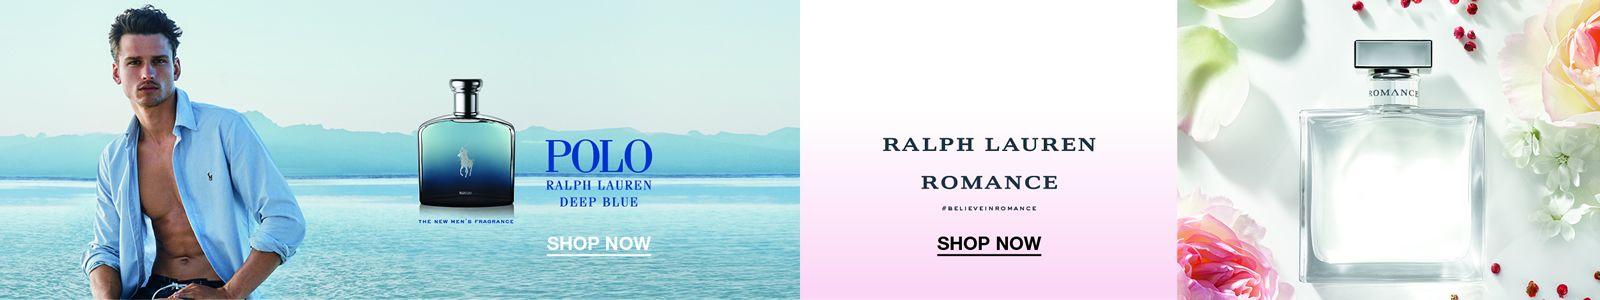 Polo Ralph Lauren, Deep Blue, Shop Now, Ralph Lauren, Romance, Shop Now